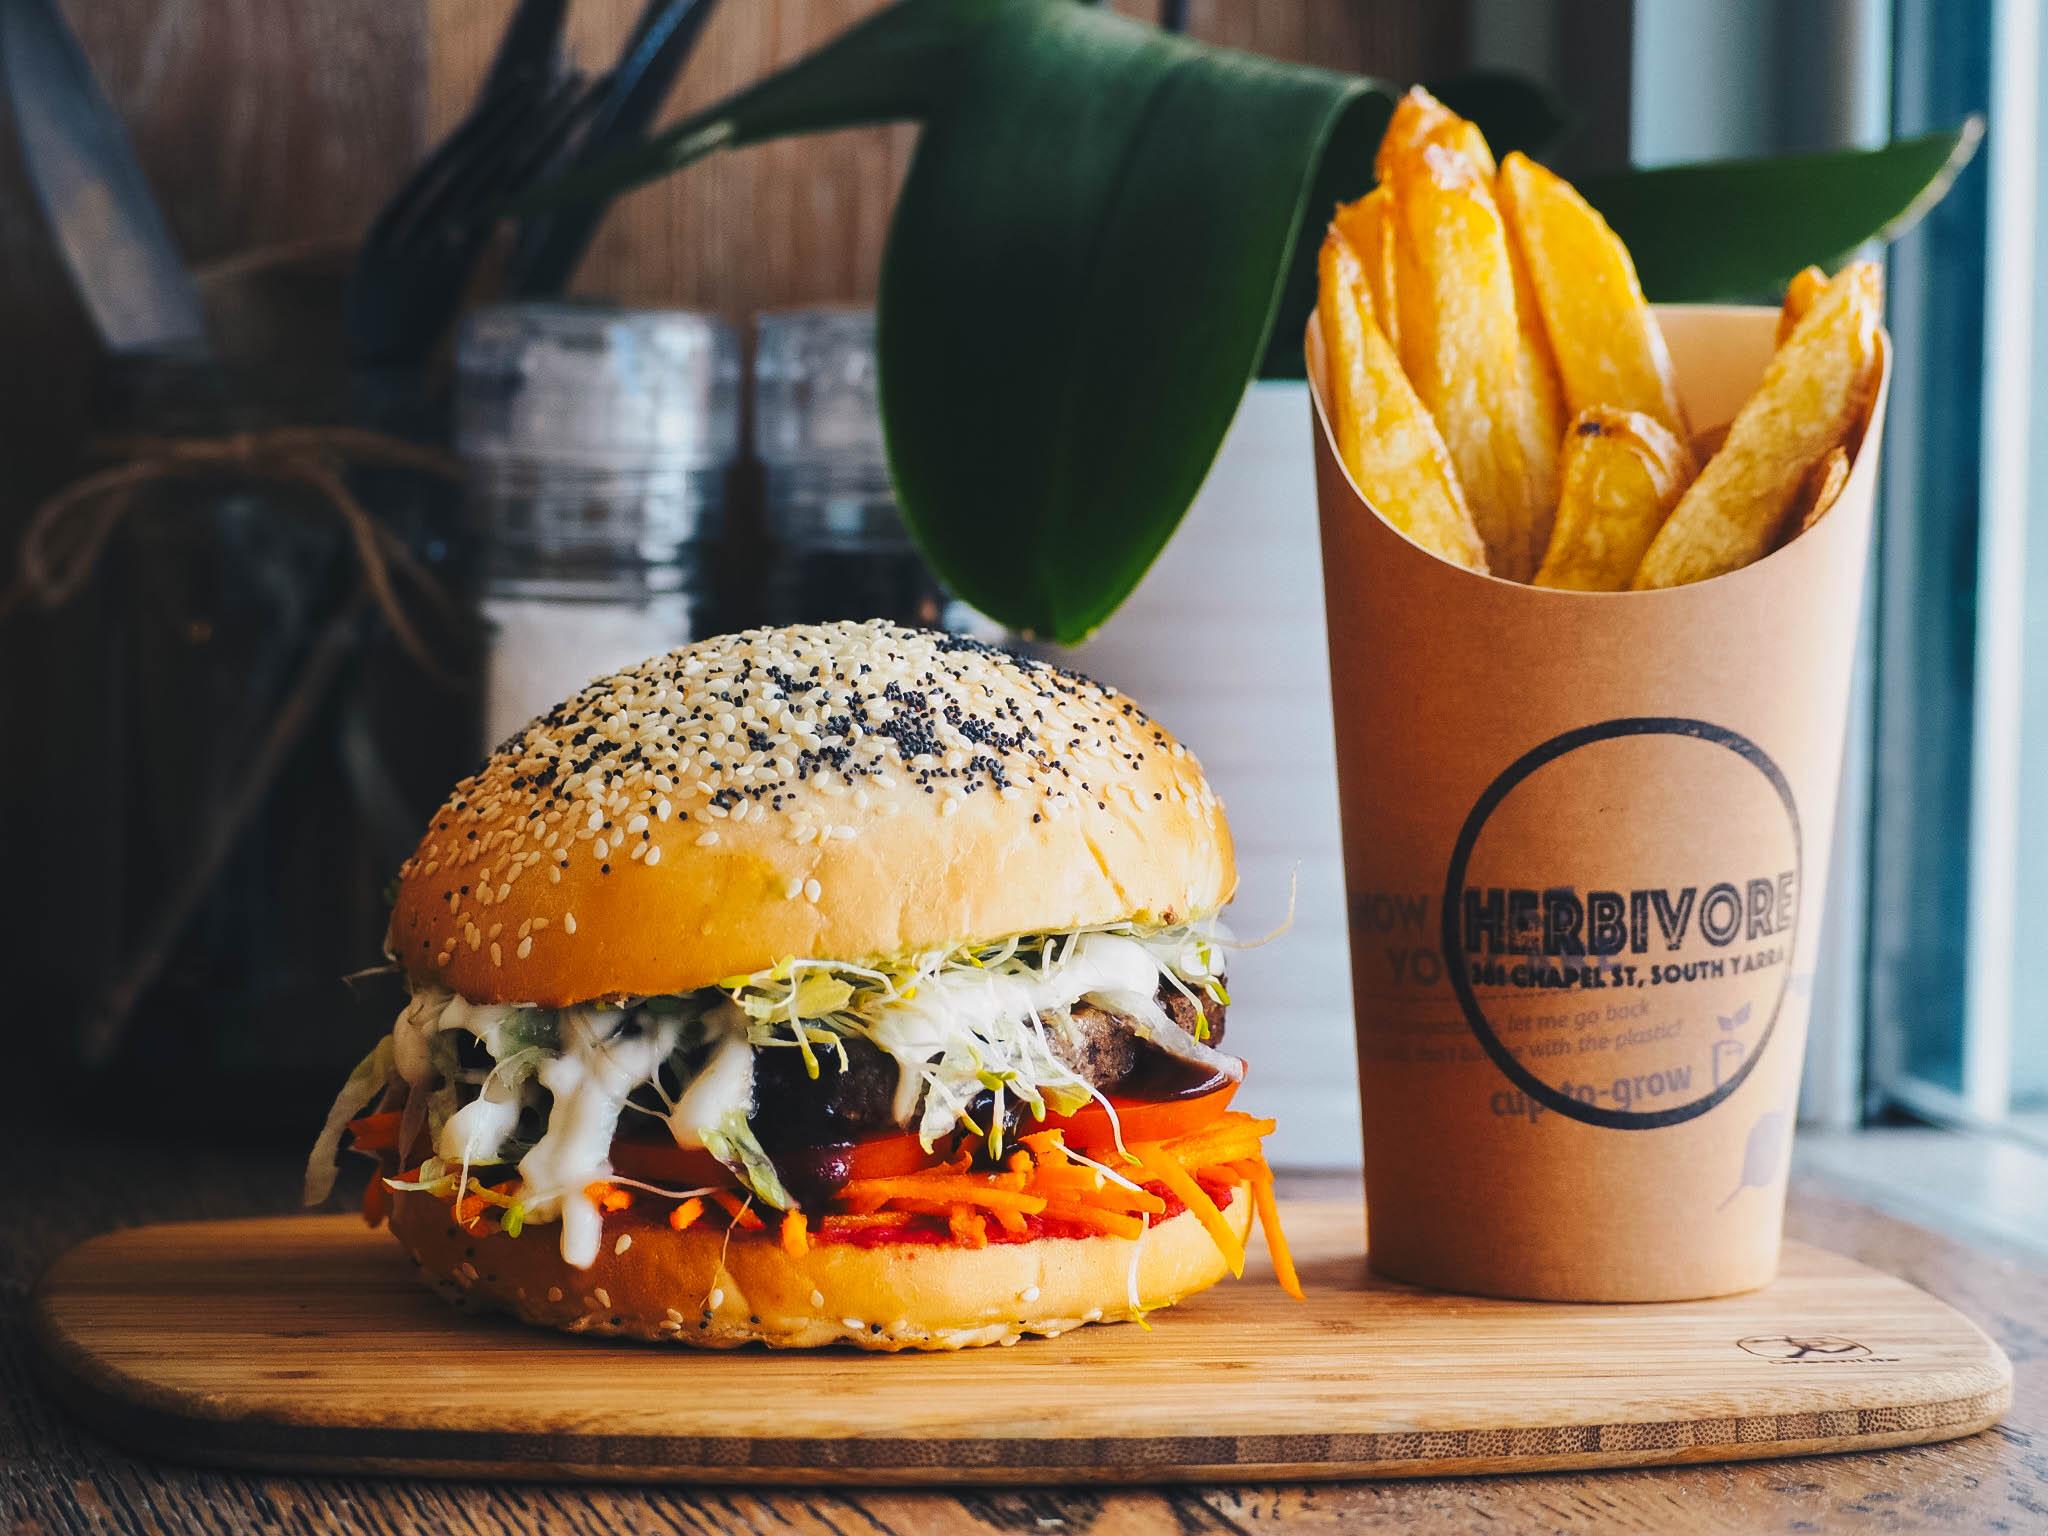 herbivore-eatery-vegan